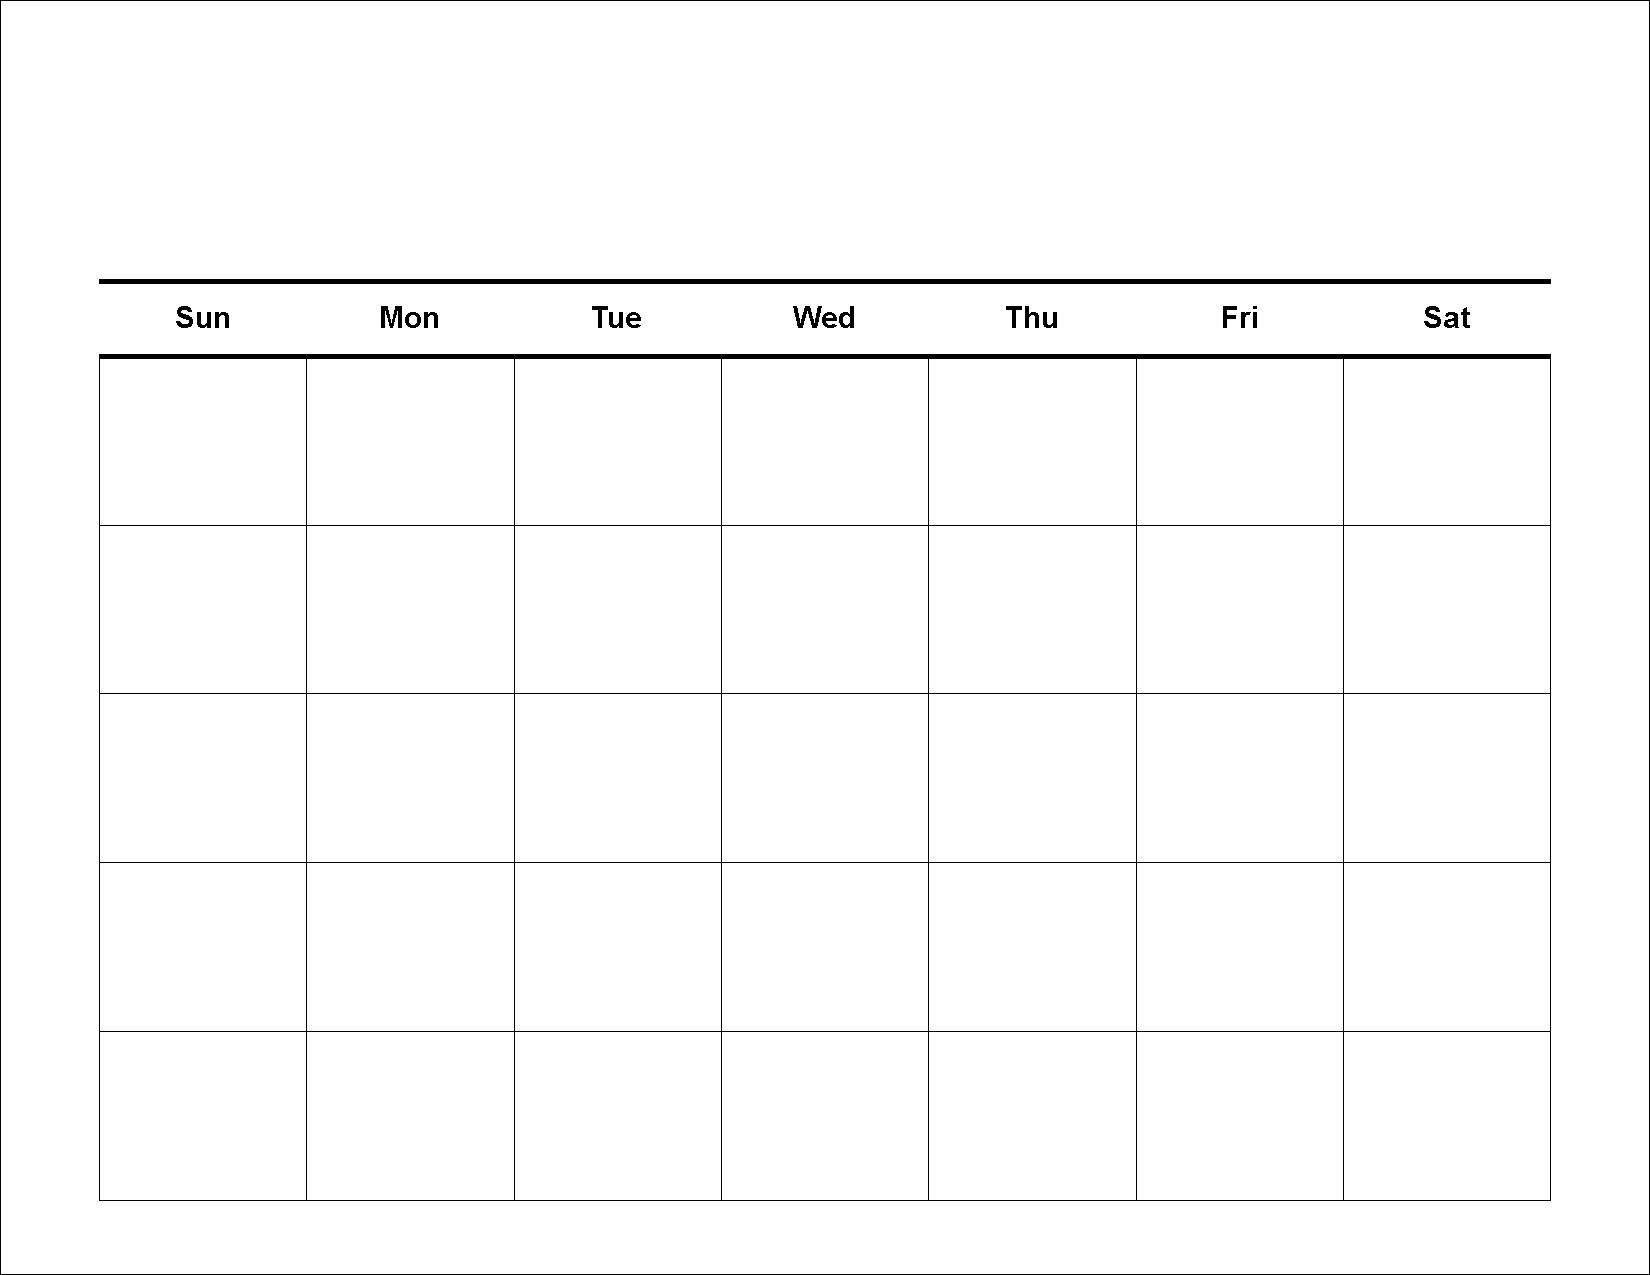 17 Best images about Calendars on Pinterest | Chore calendar ...